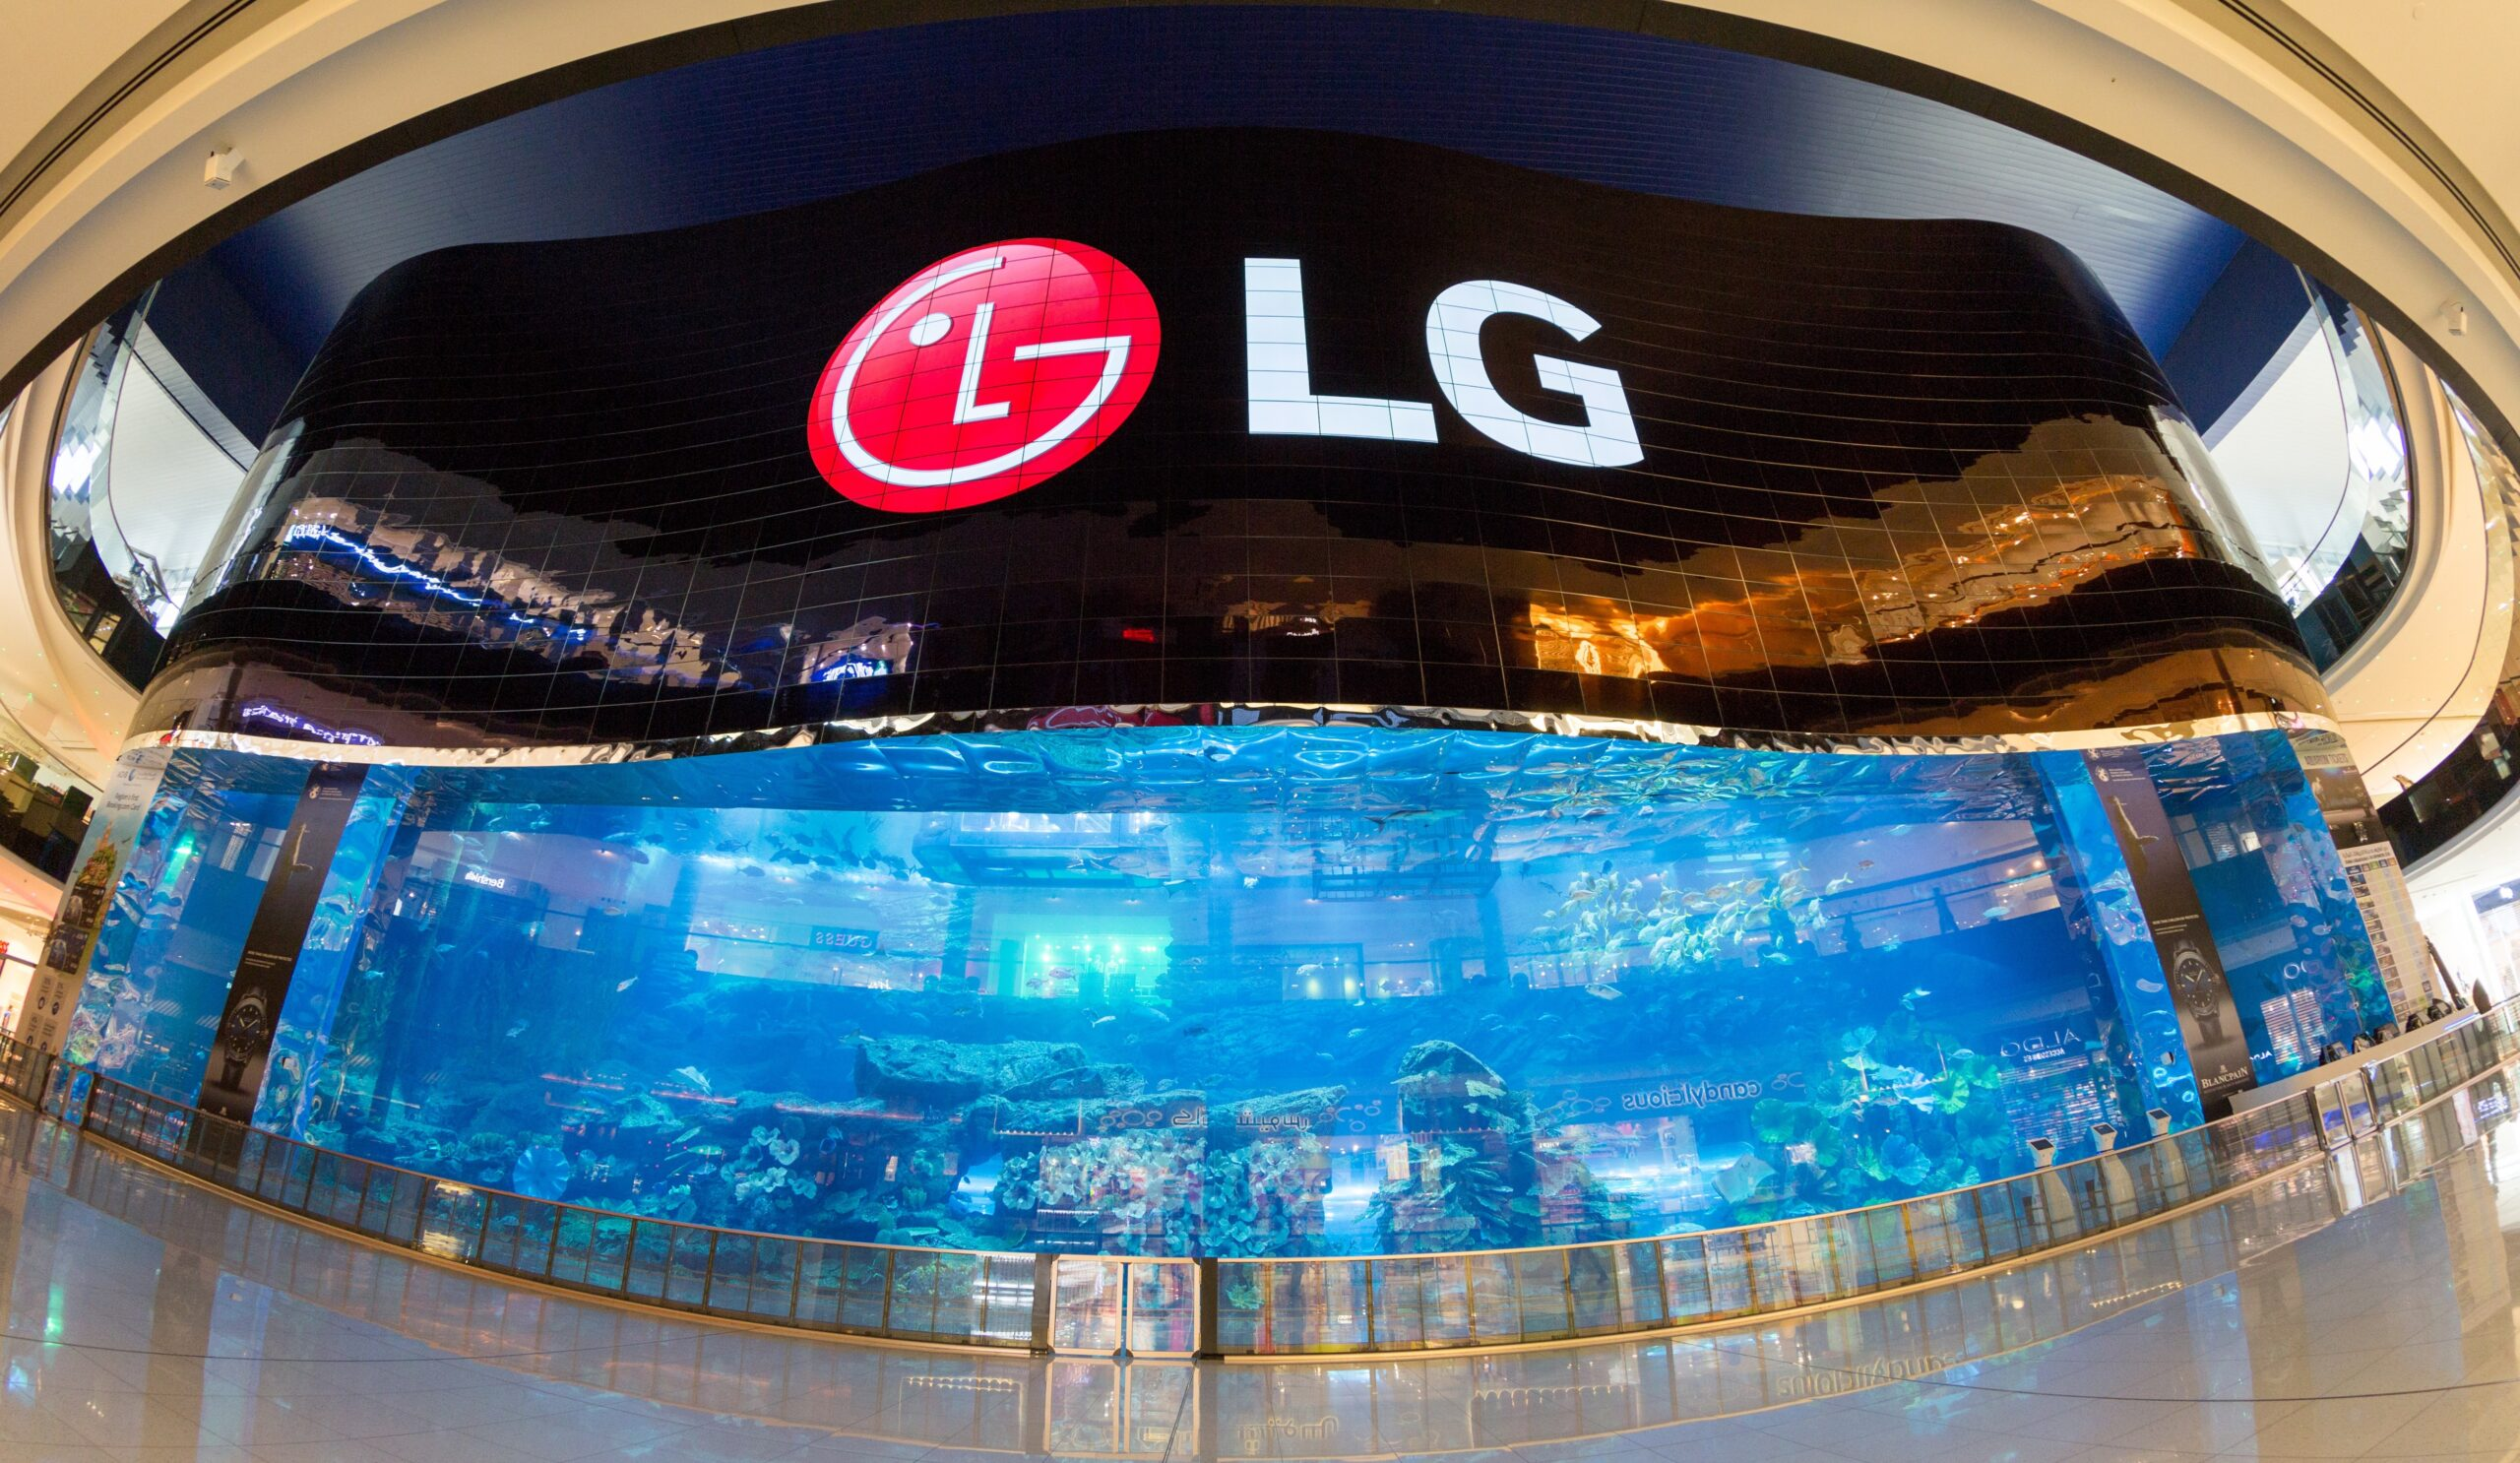 A gigantic LG OLED video wall signage displaying the logo of LG at the Dubai Aquarium